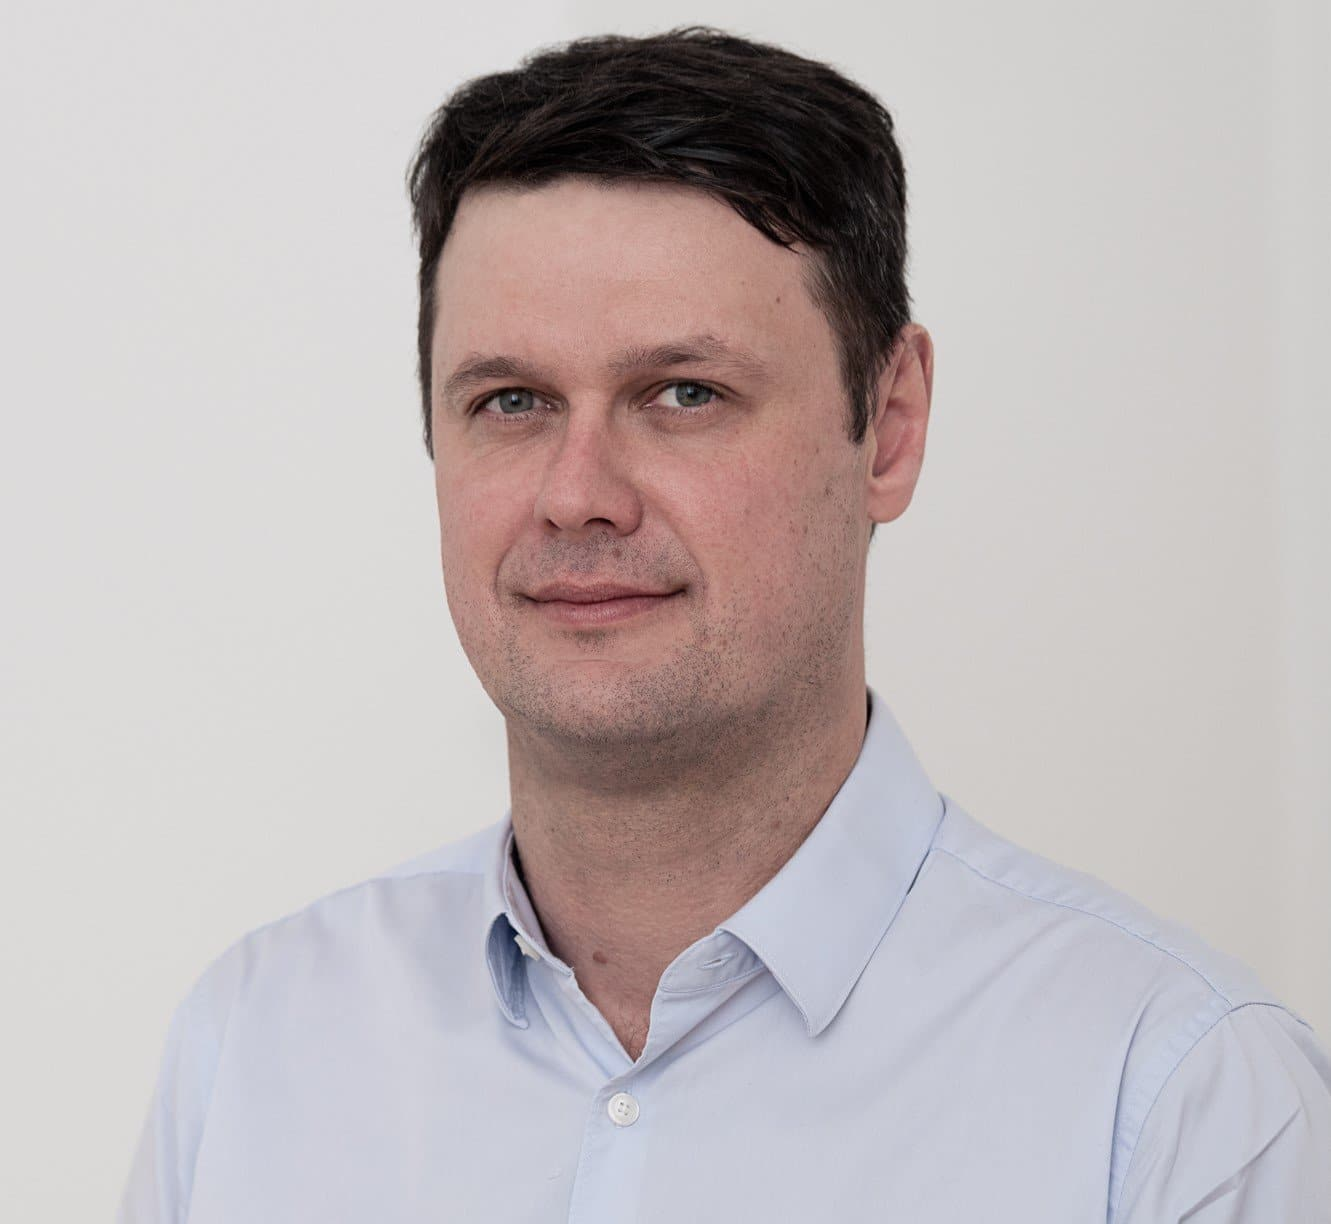 Constantin Köck PlanRadar Interview